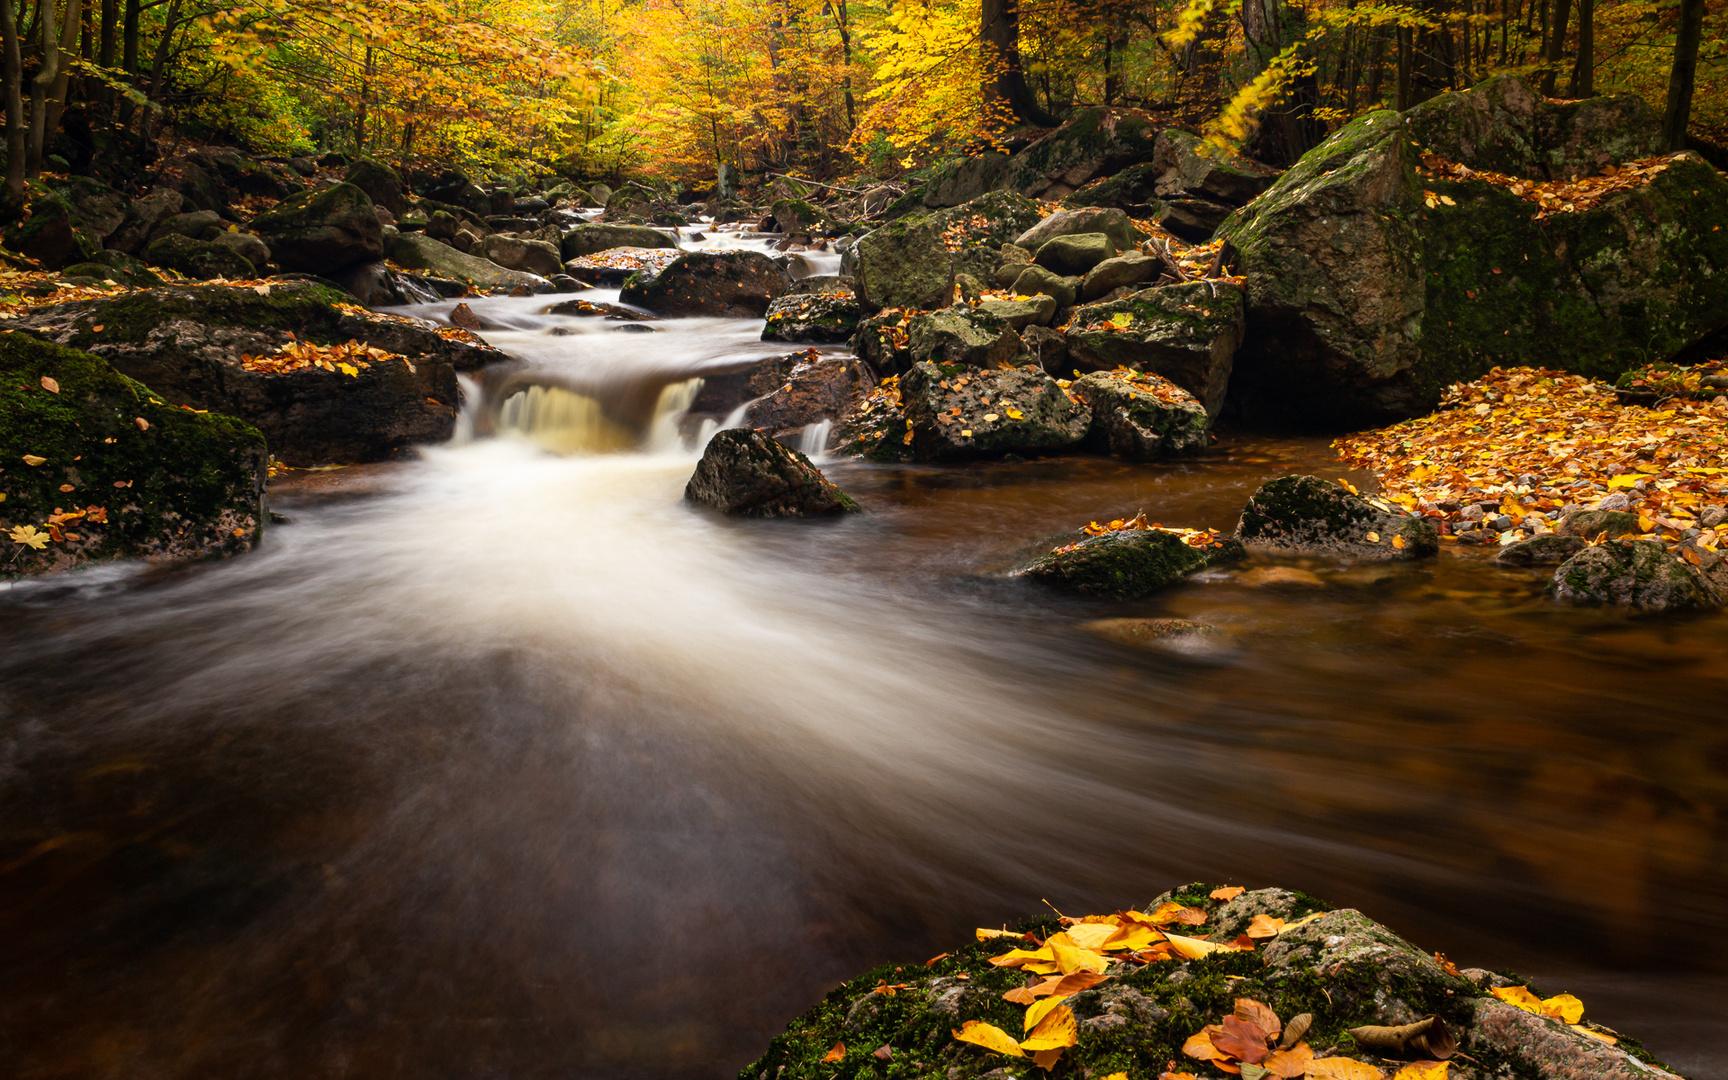 - swooshing waters -